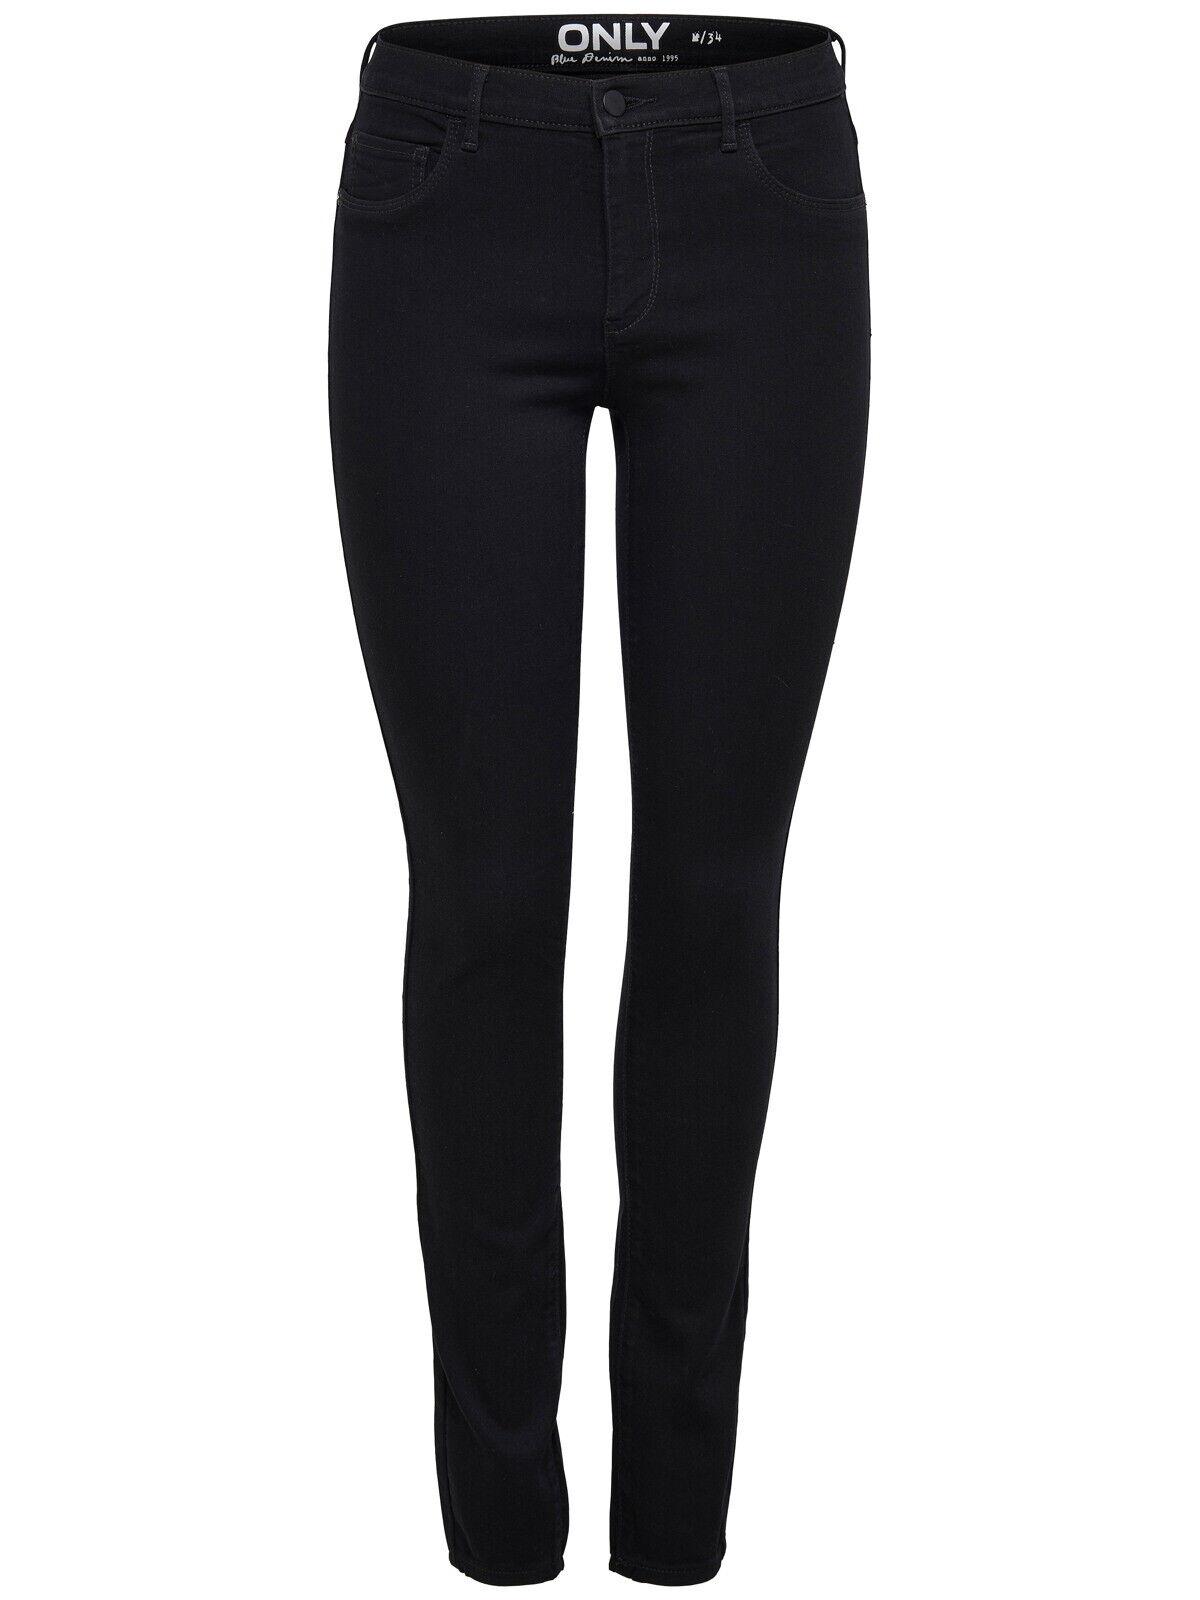 Only Damen Stretch Jeans-Look Röhre Skinny Hose schwarz Jeggings Treggings NEU